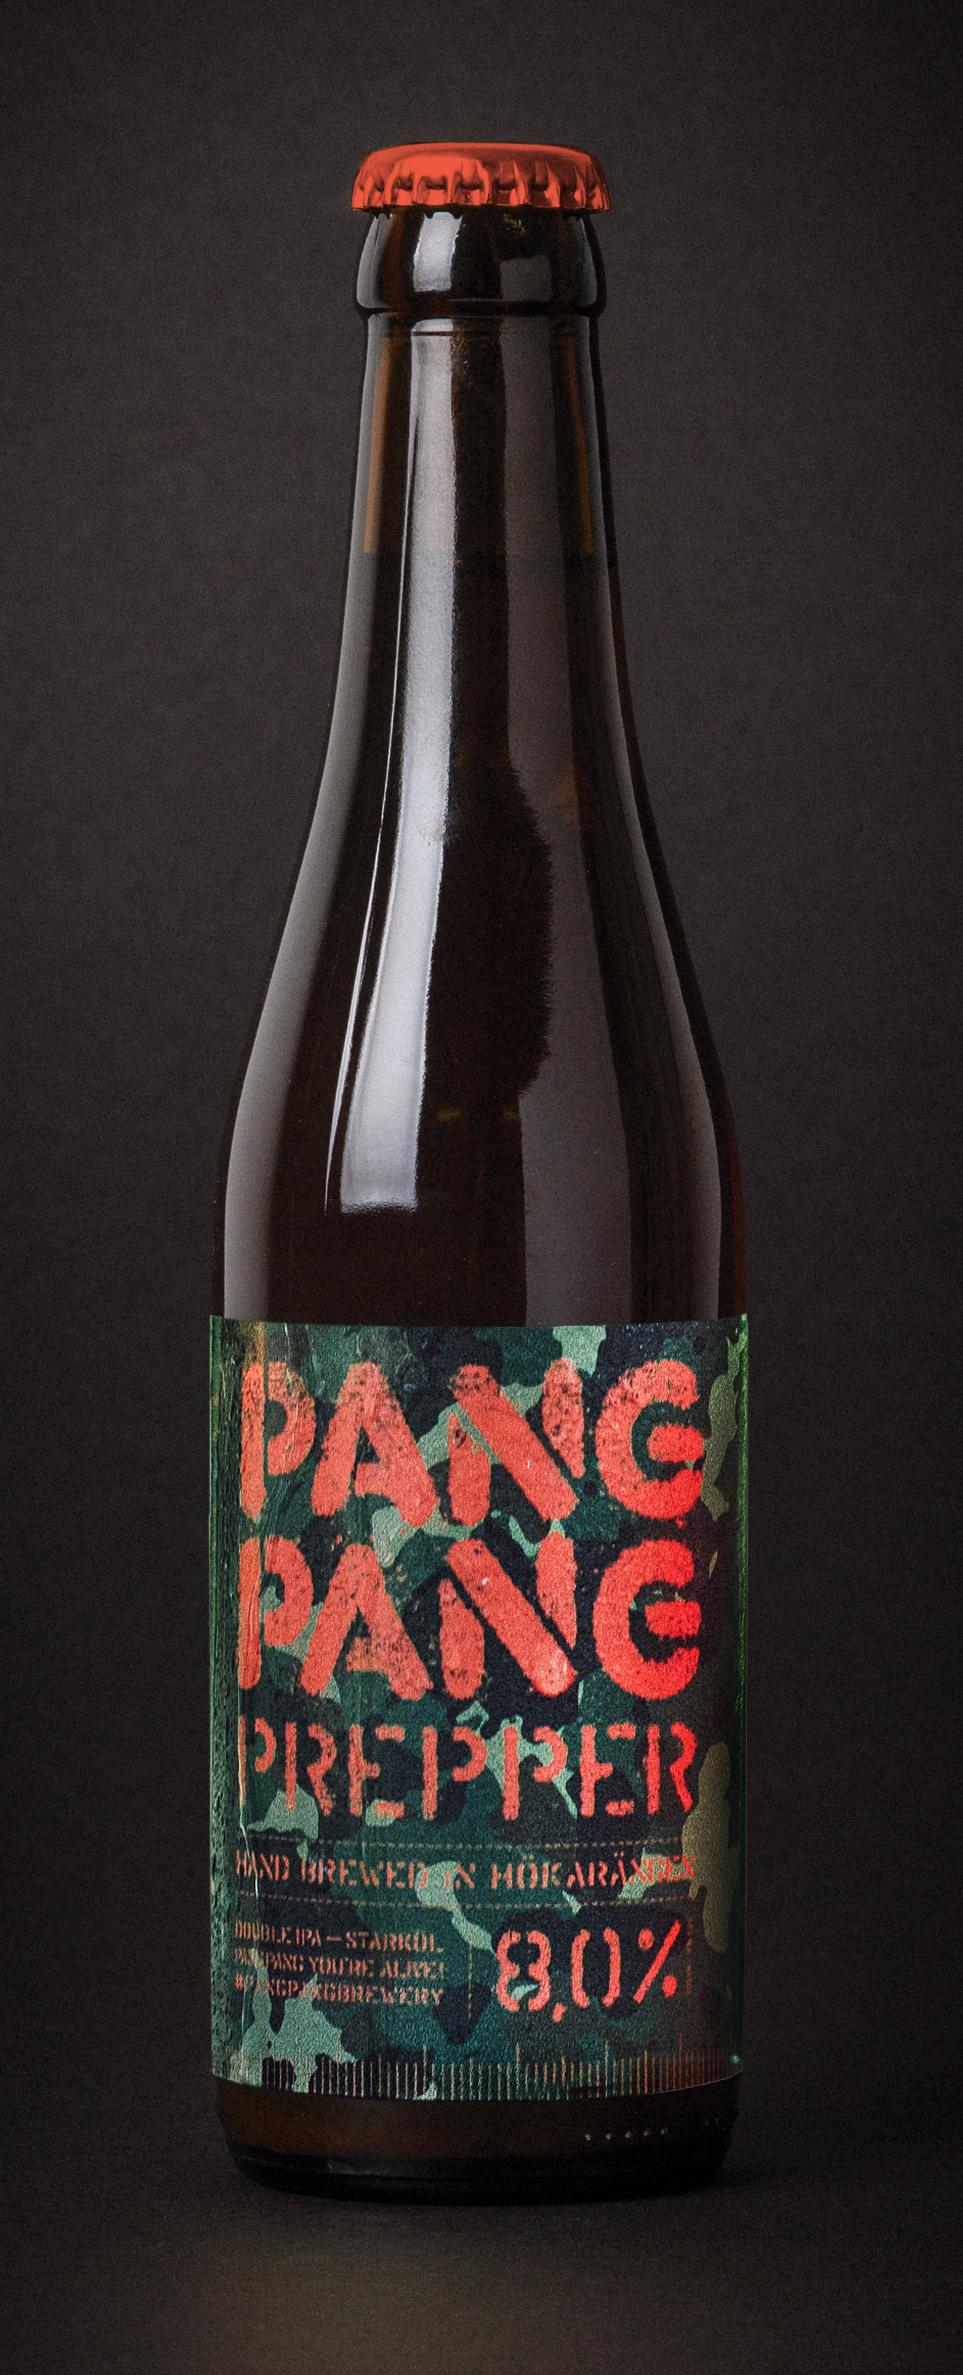 PangPang Prepper  Survival Double IPA. 8,0% · 33 centiliter